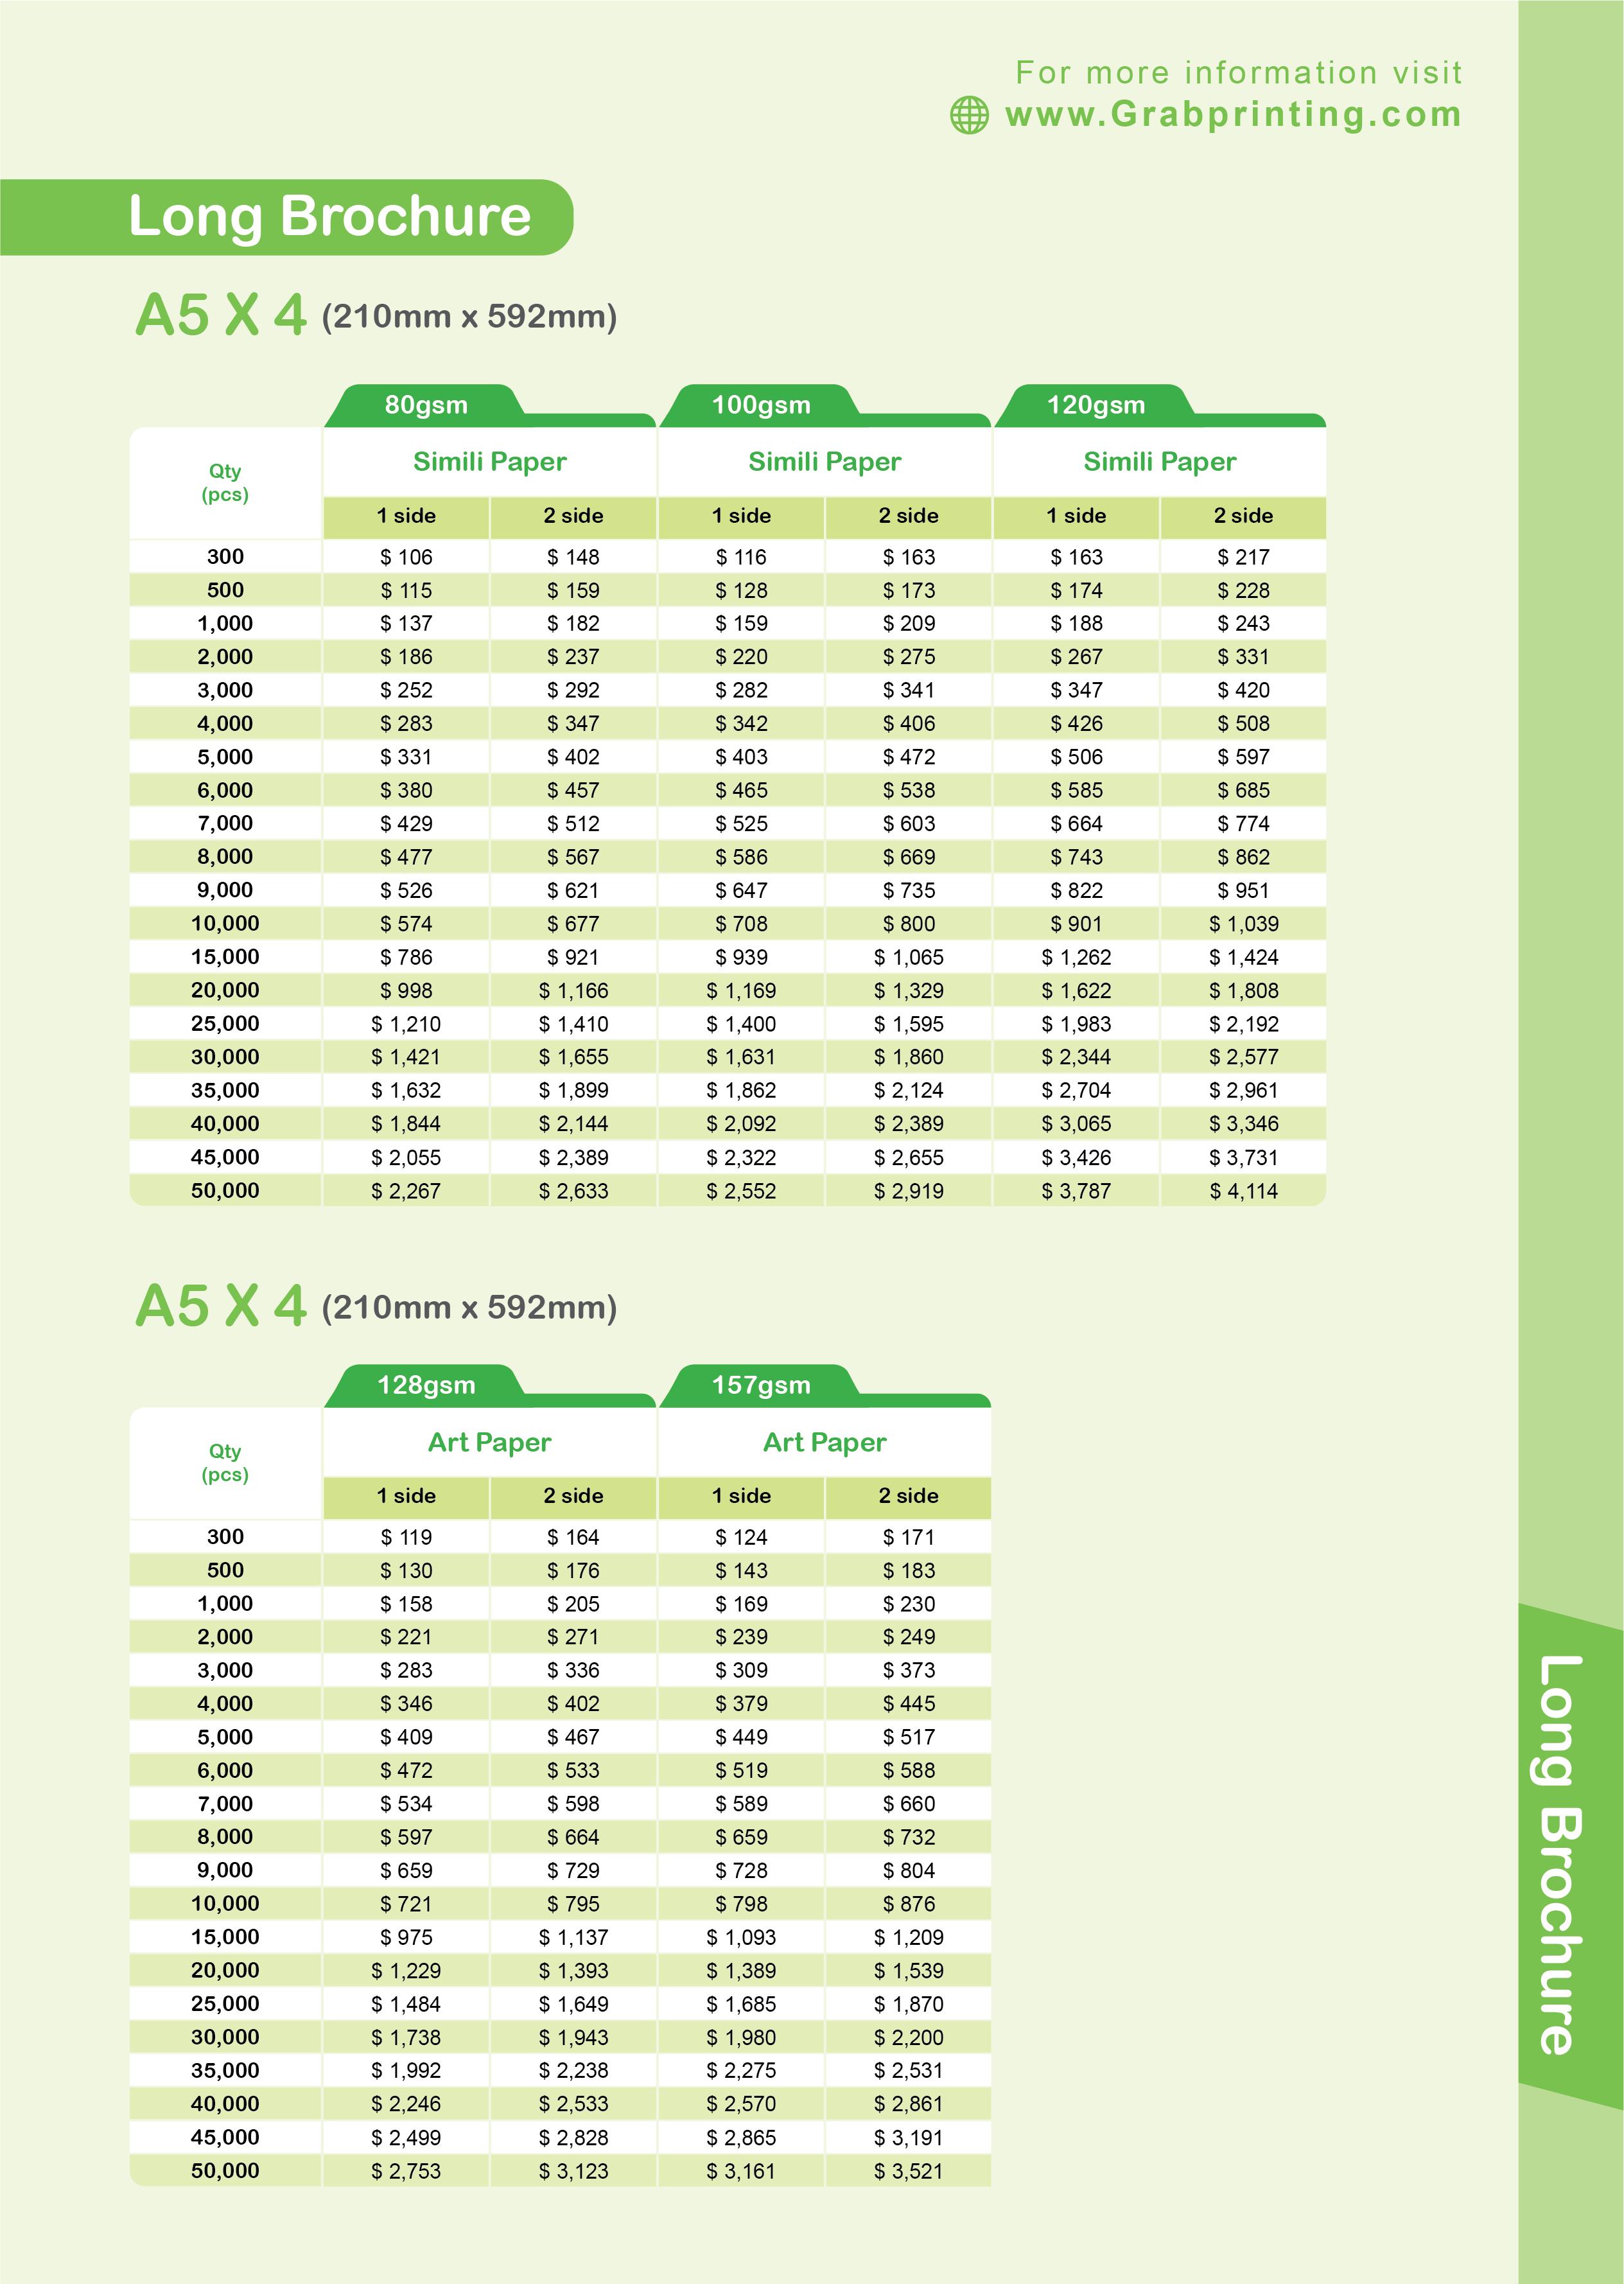 brochure printing Brochure Printing Long Brochure A5 x 4 Paper Price List